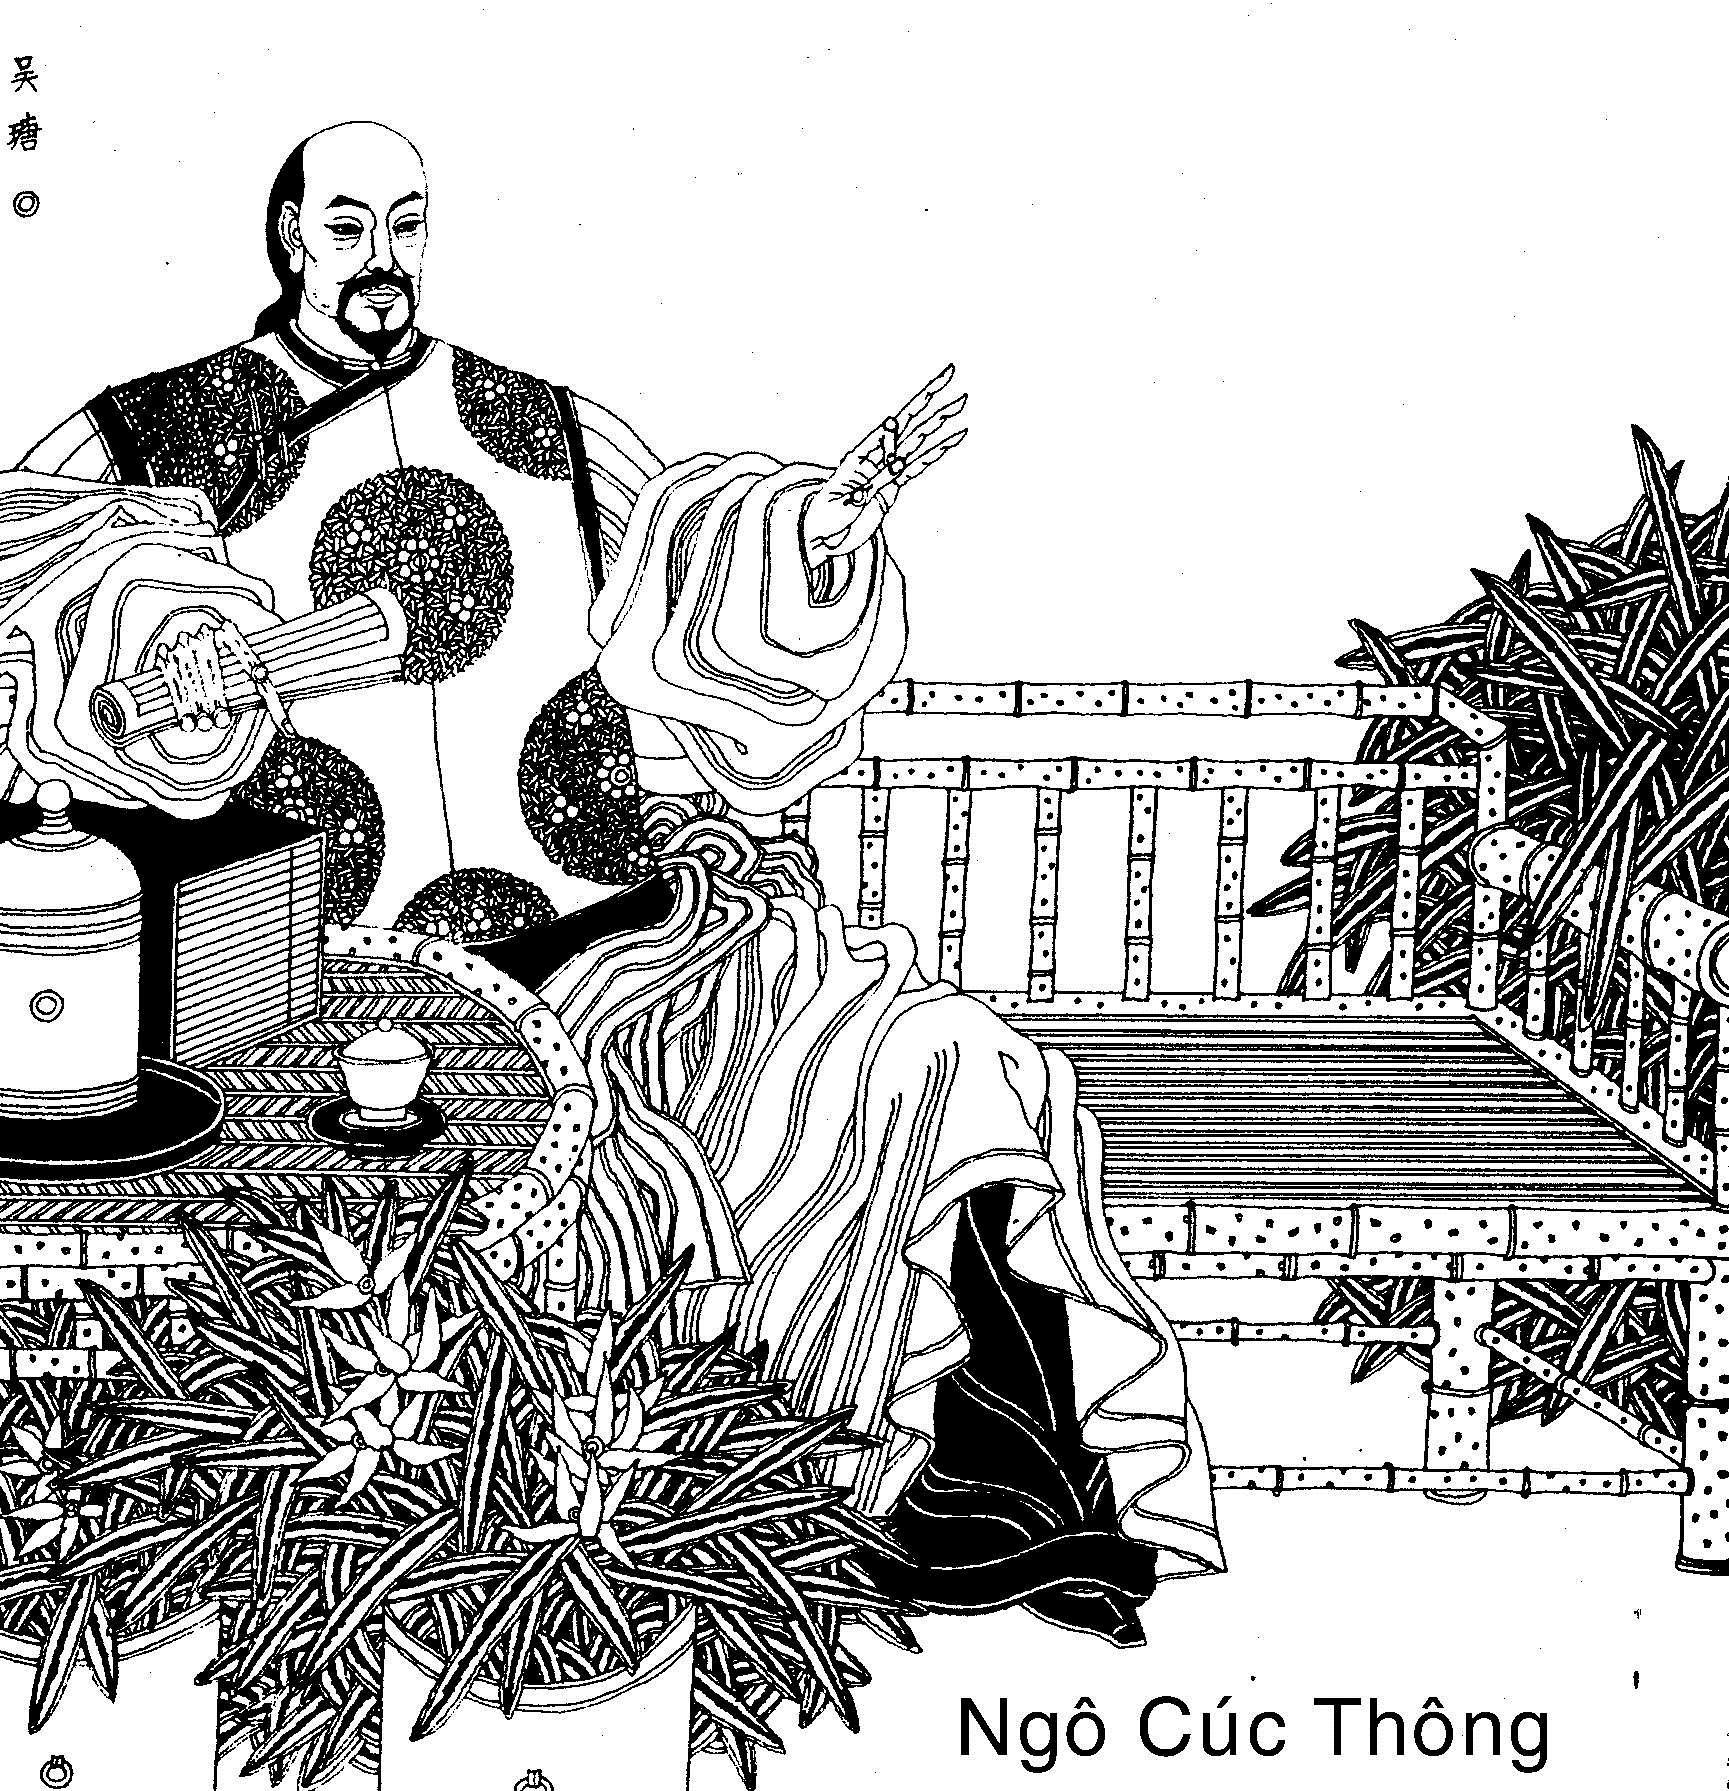 NGO CUC THONG